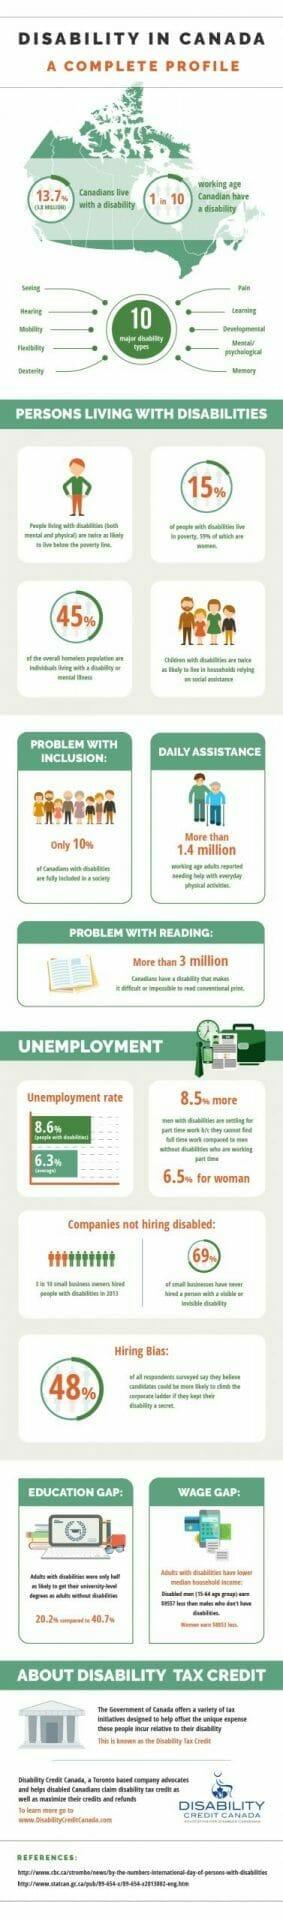 Disability Statistics in Canada